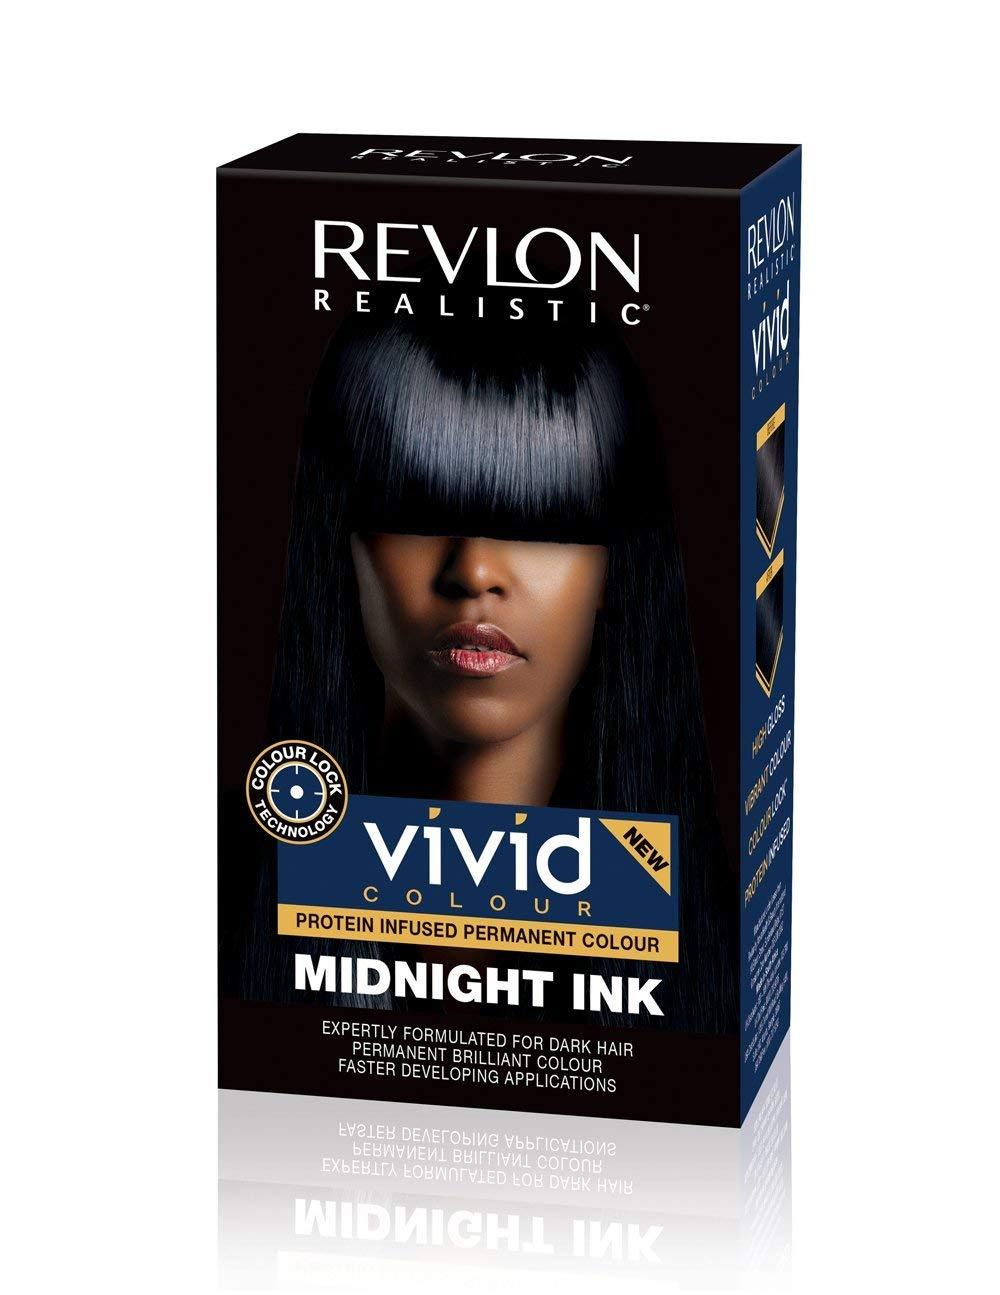 Revlon Realistic Vivid Colour Permanent Dark Hair Dye Color with Colour Lock Technology, Midnight Ink 110ml